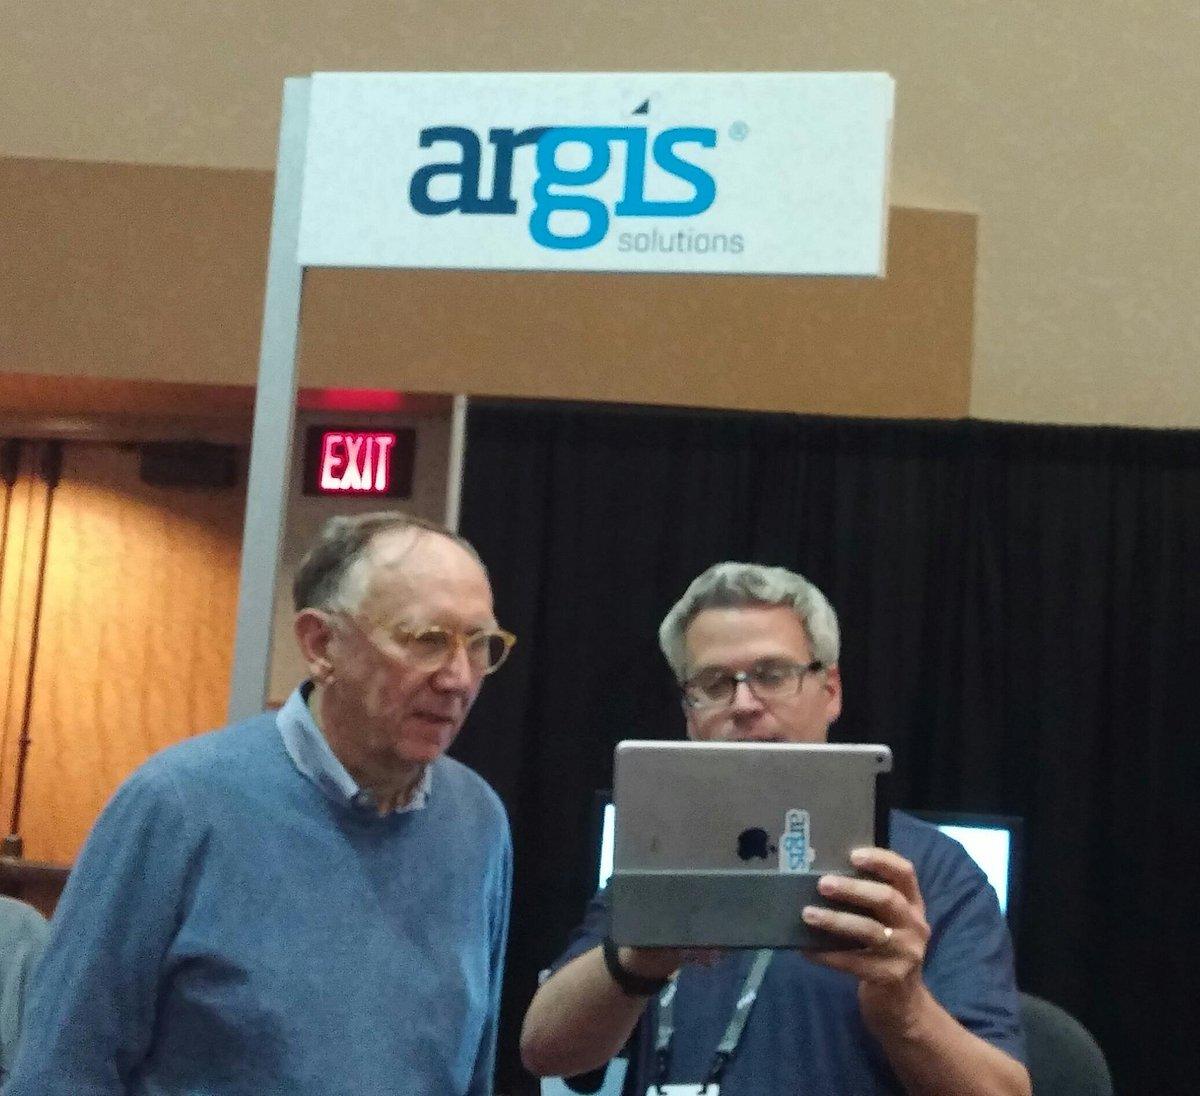 Jack Dangermond checks out the Argis® Framework